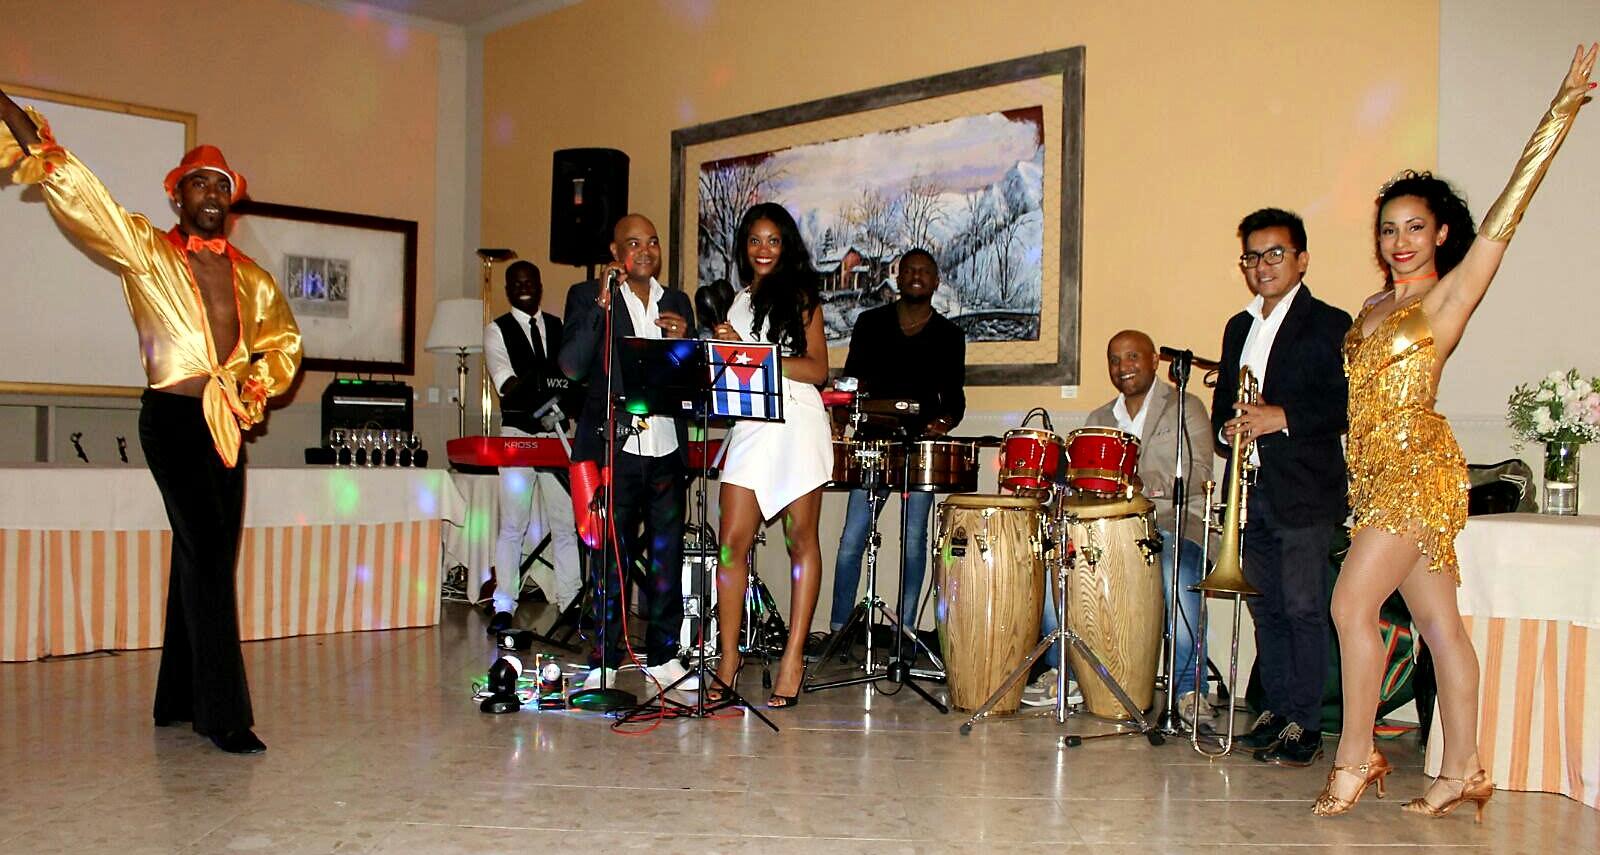 musica jazz and soul milano matrimoni